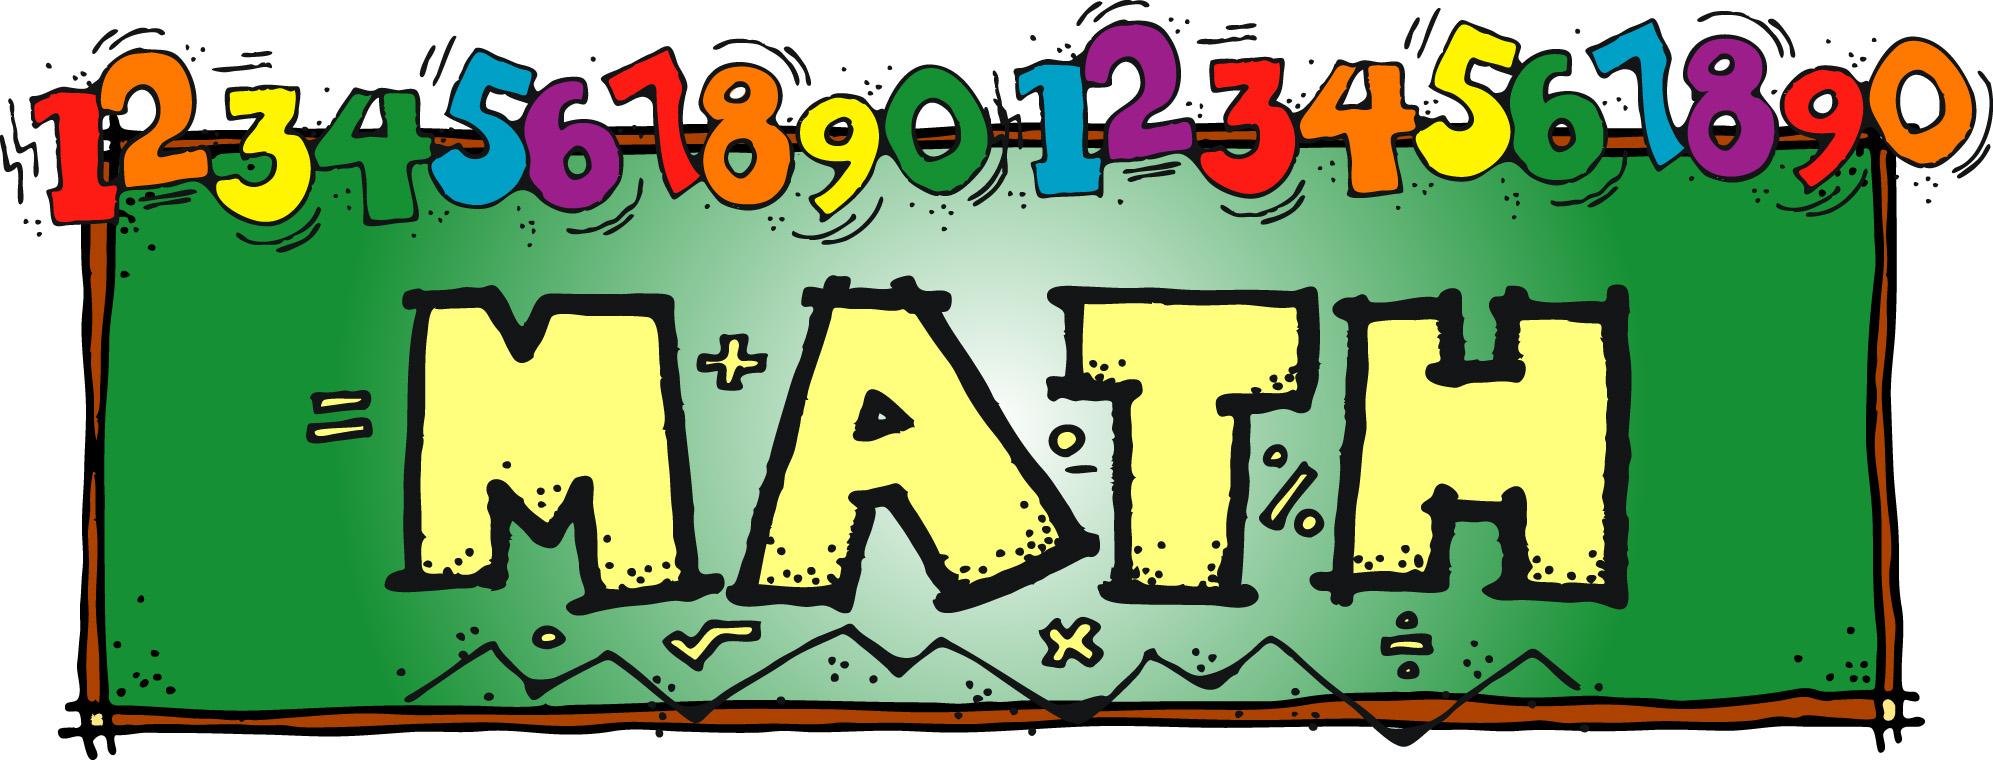 Math clipart free clip art images